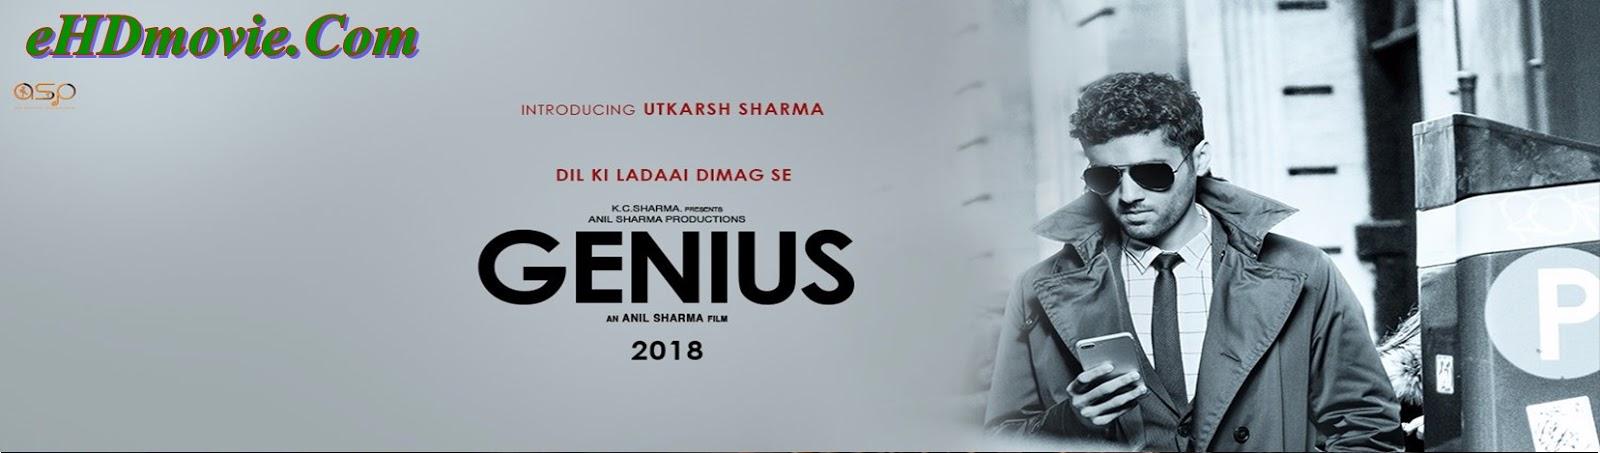 Genius 2018 Full Movie Hindi 1080p - 720p - HEVC - 480p ORG HDRip 400MB - 650MB - 1.4GB - 3GB ESubs Free Download